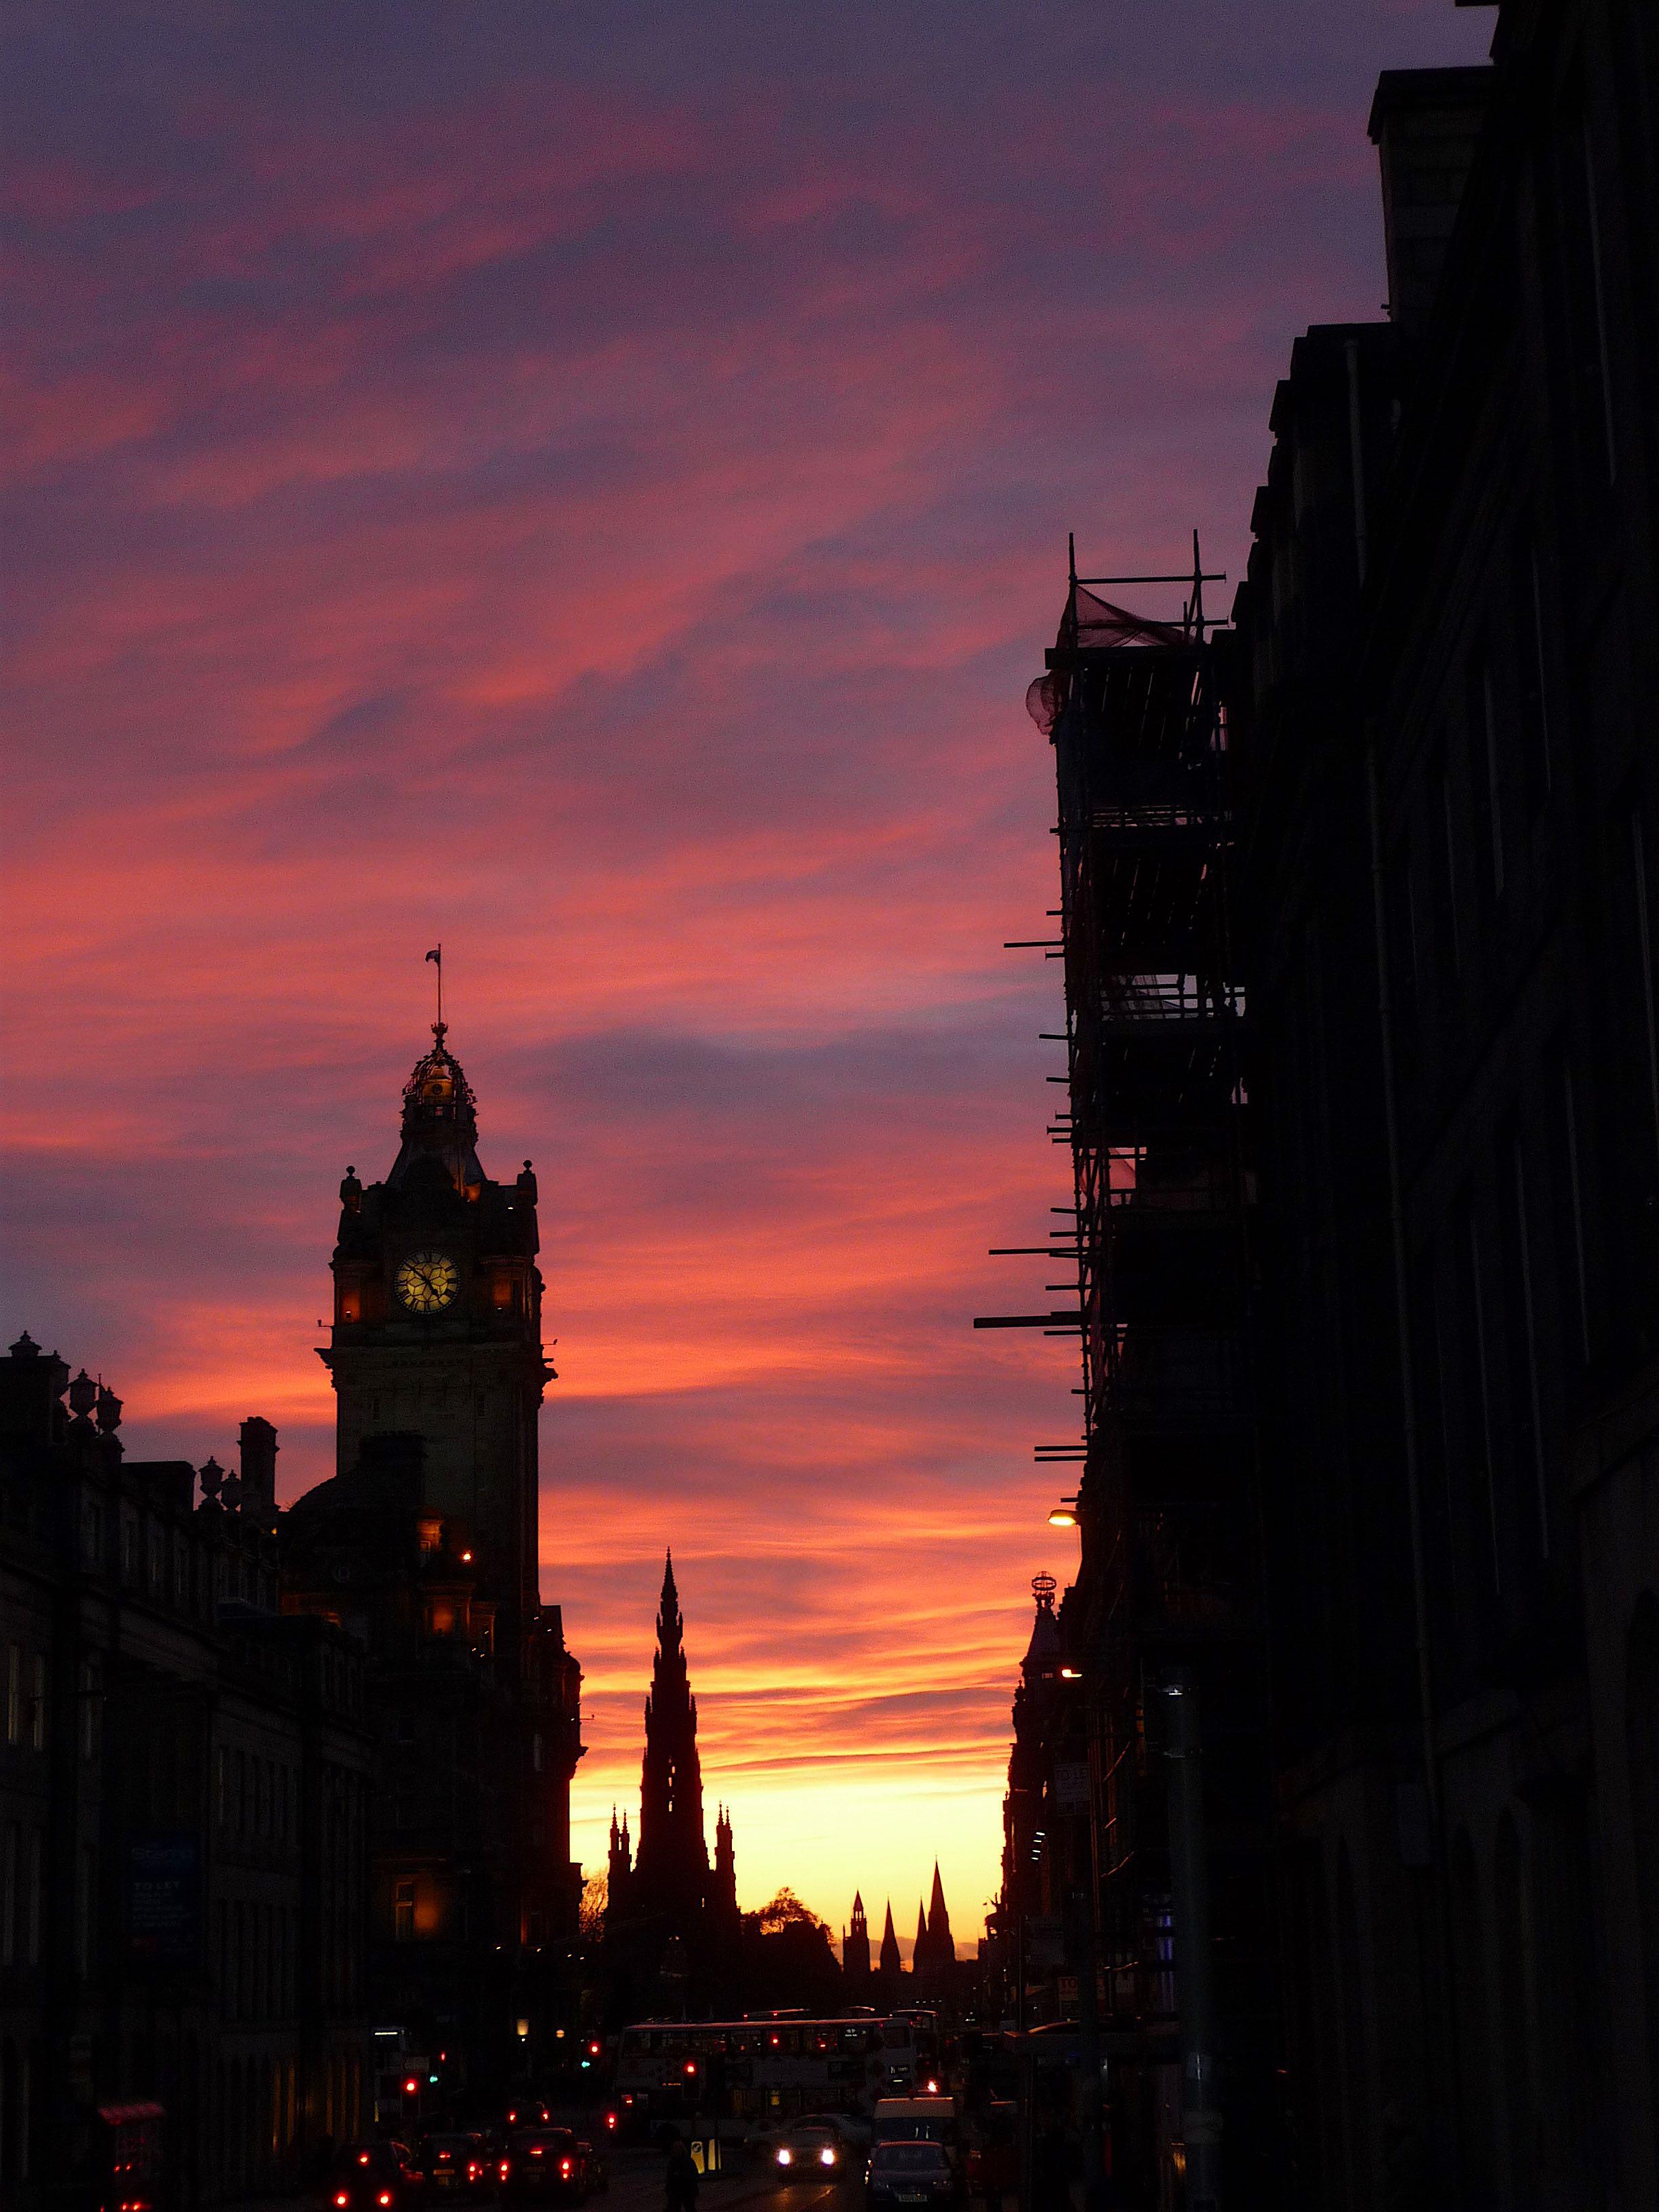 4.Edinburgh